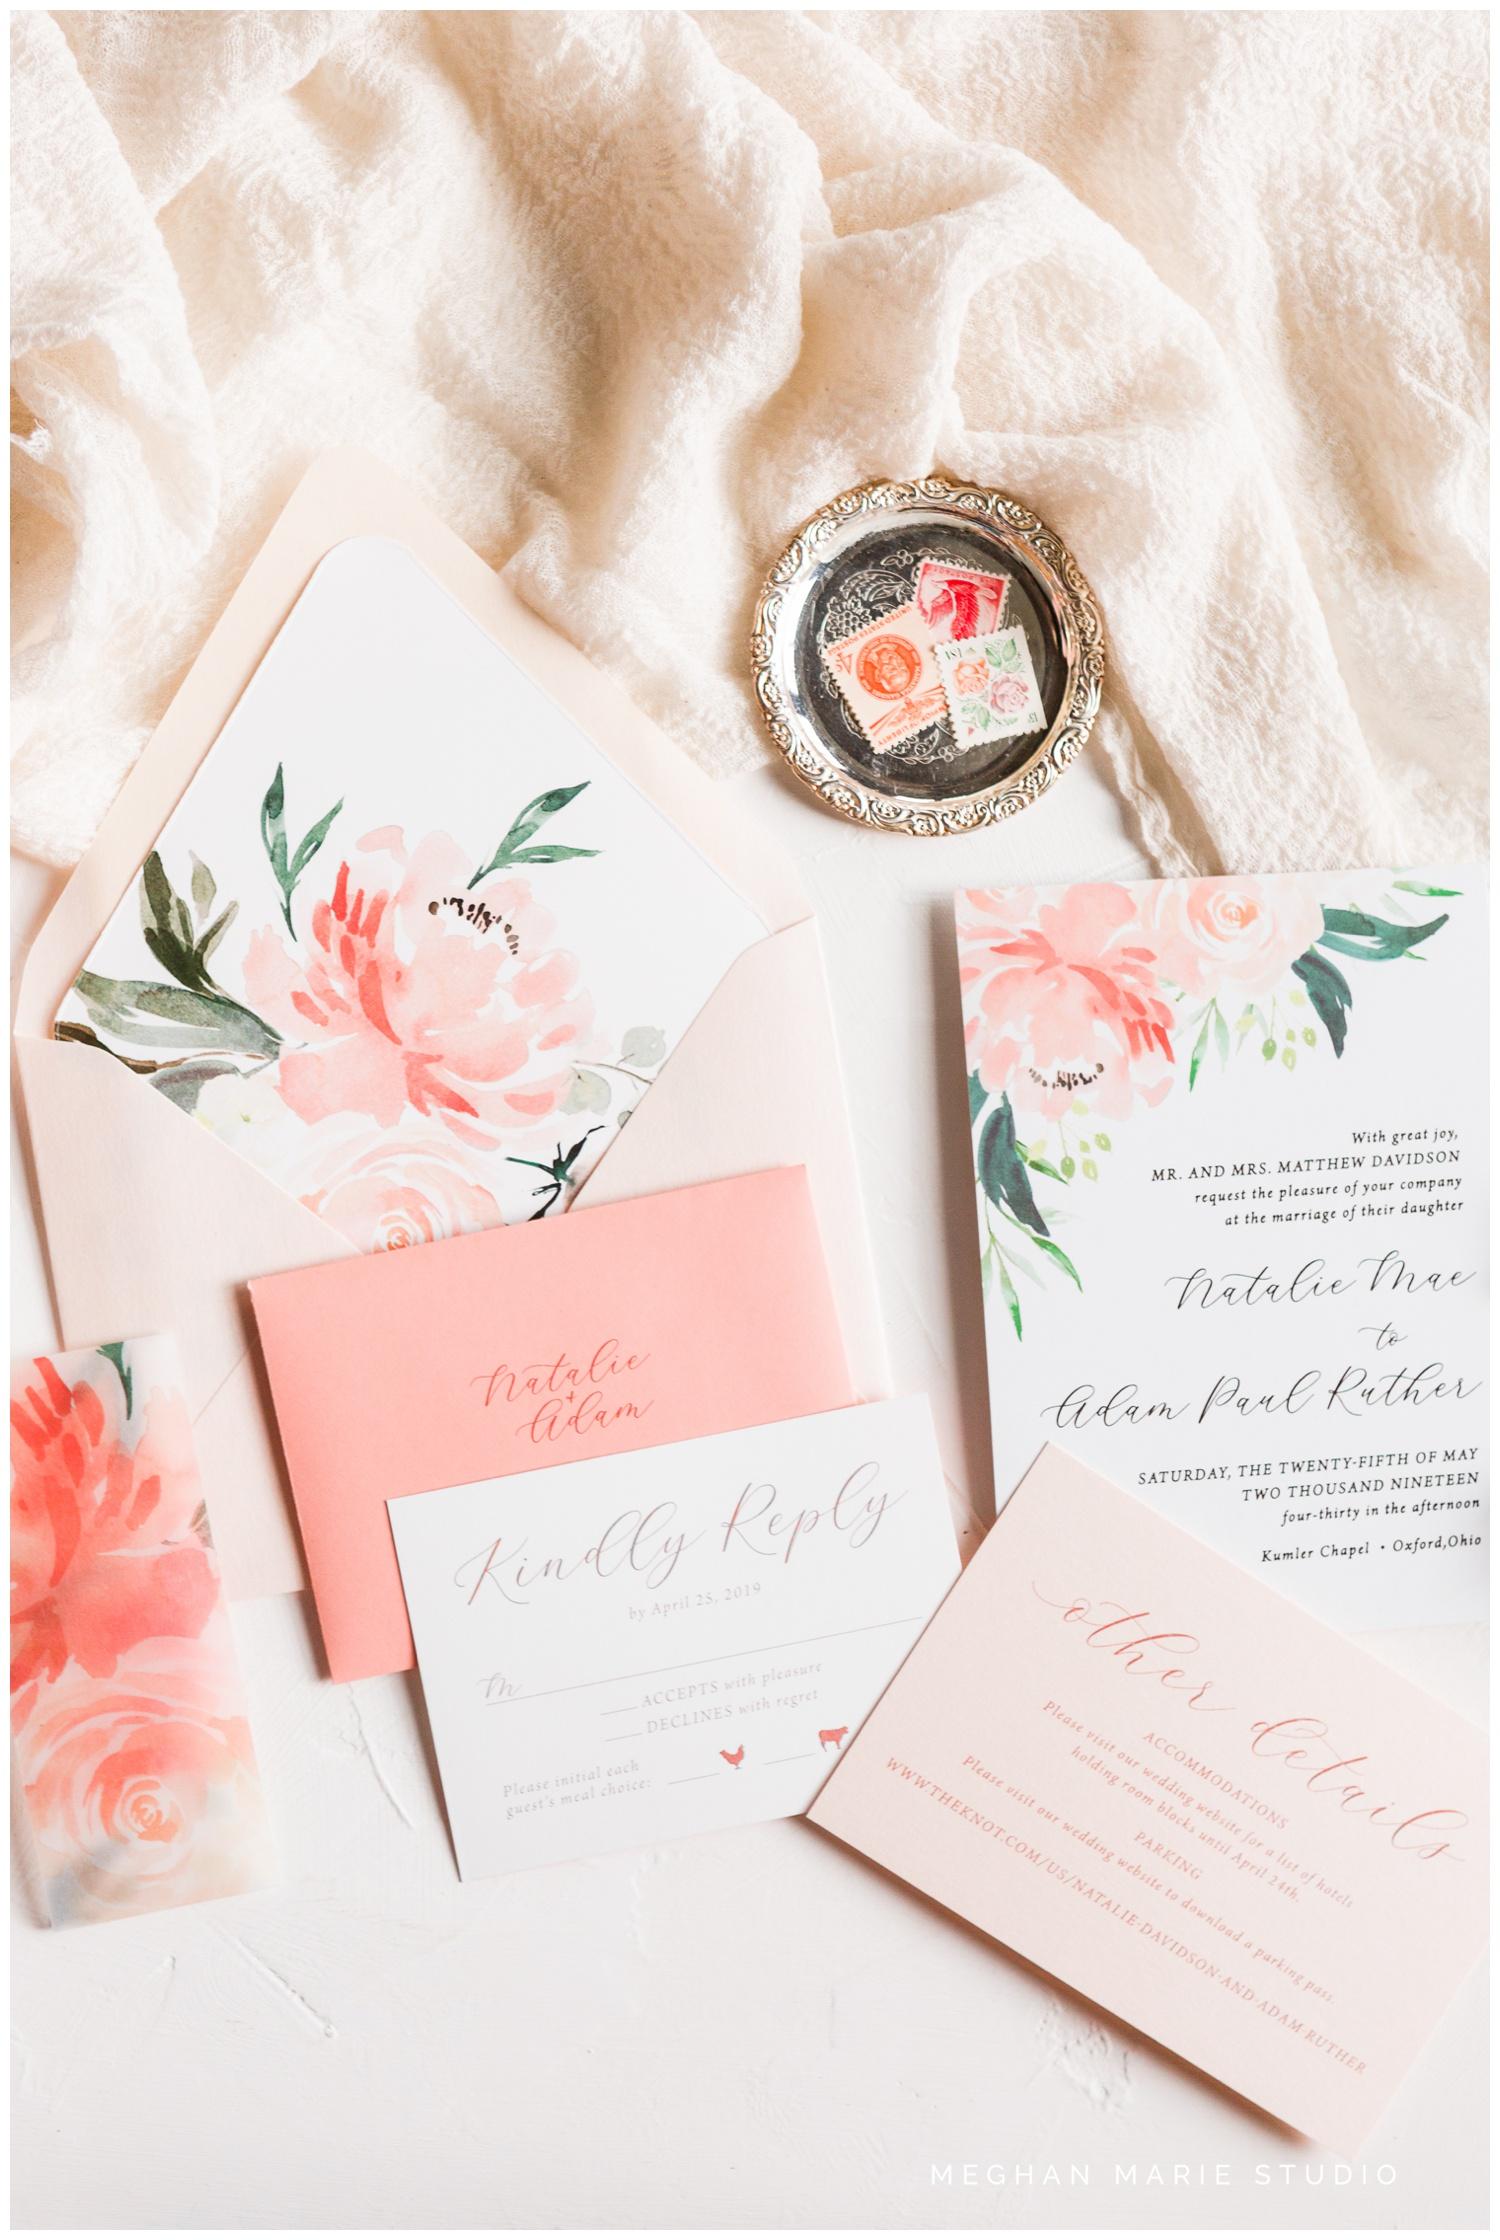 ivory-house-creative-kenzie-phillips-meghan-marie-studio-something-old-dayton-stationary-wedding-paper-invitations_0270.jpg